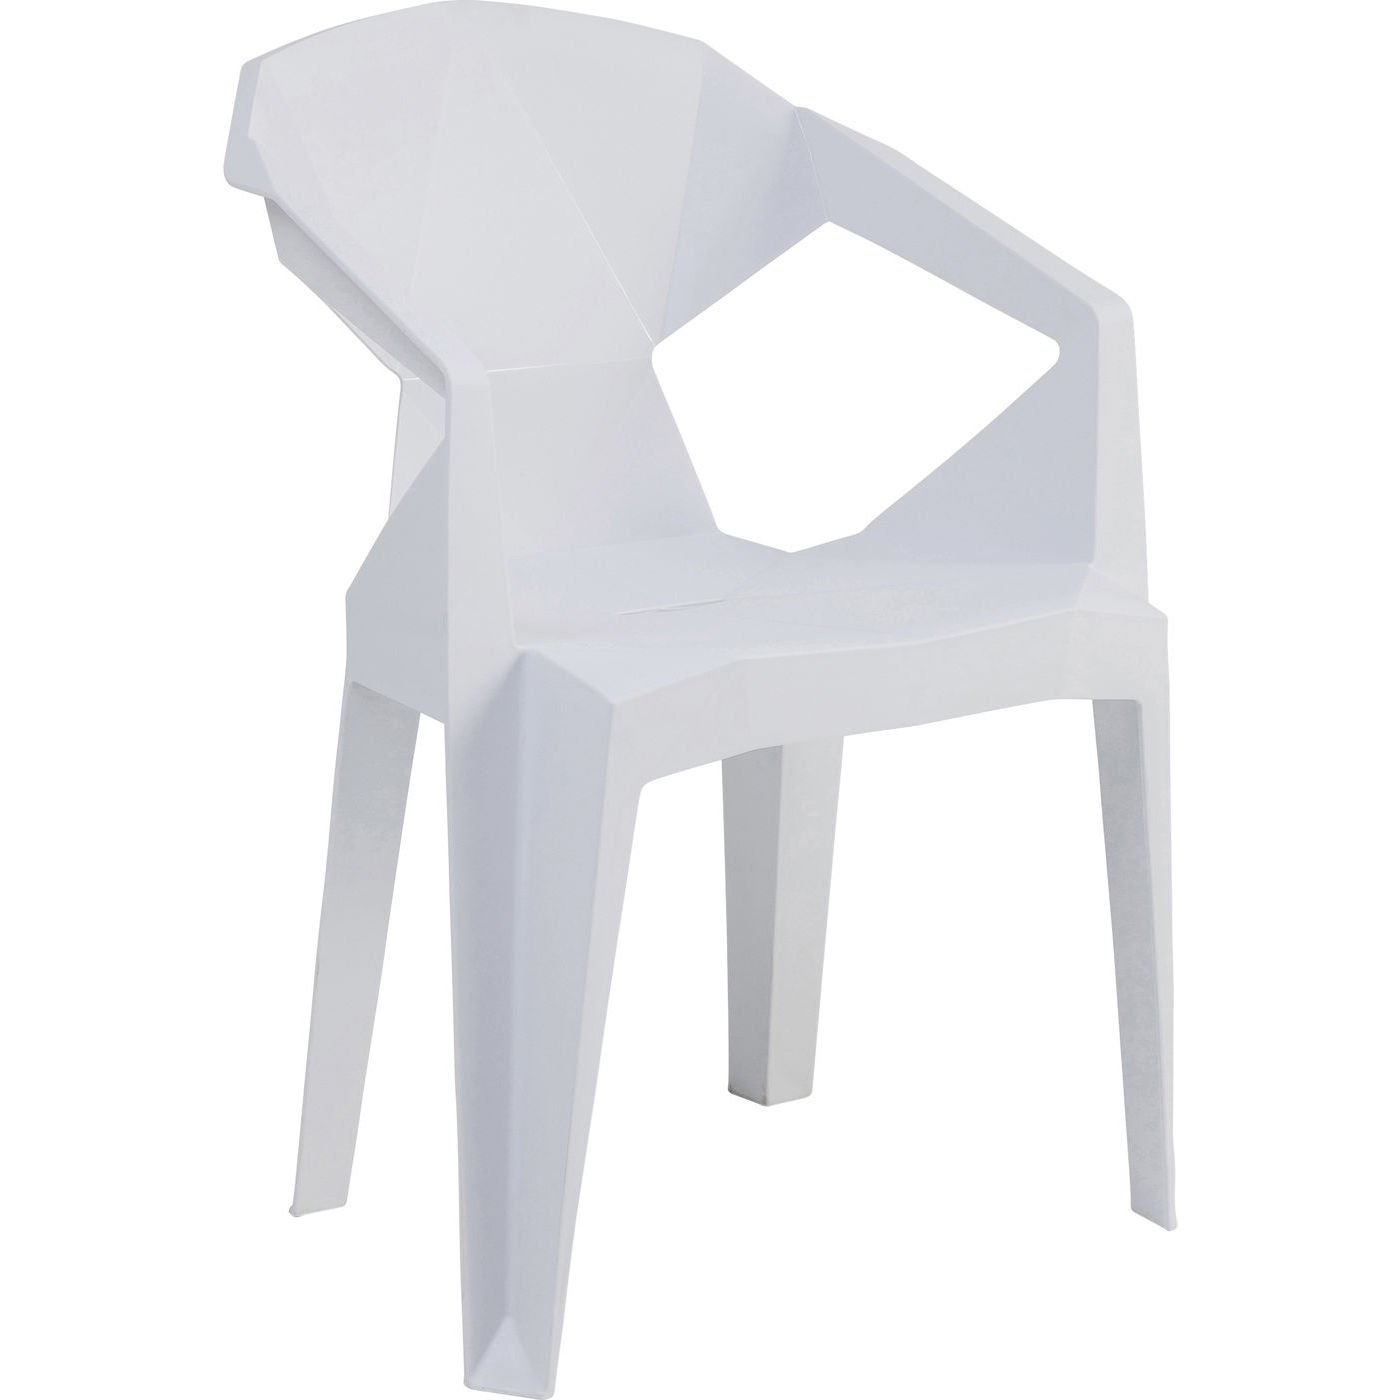 Chaise Origami Géometrial Blanche Salle à manger Kare Design